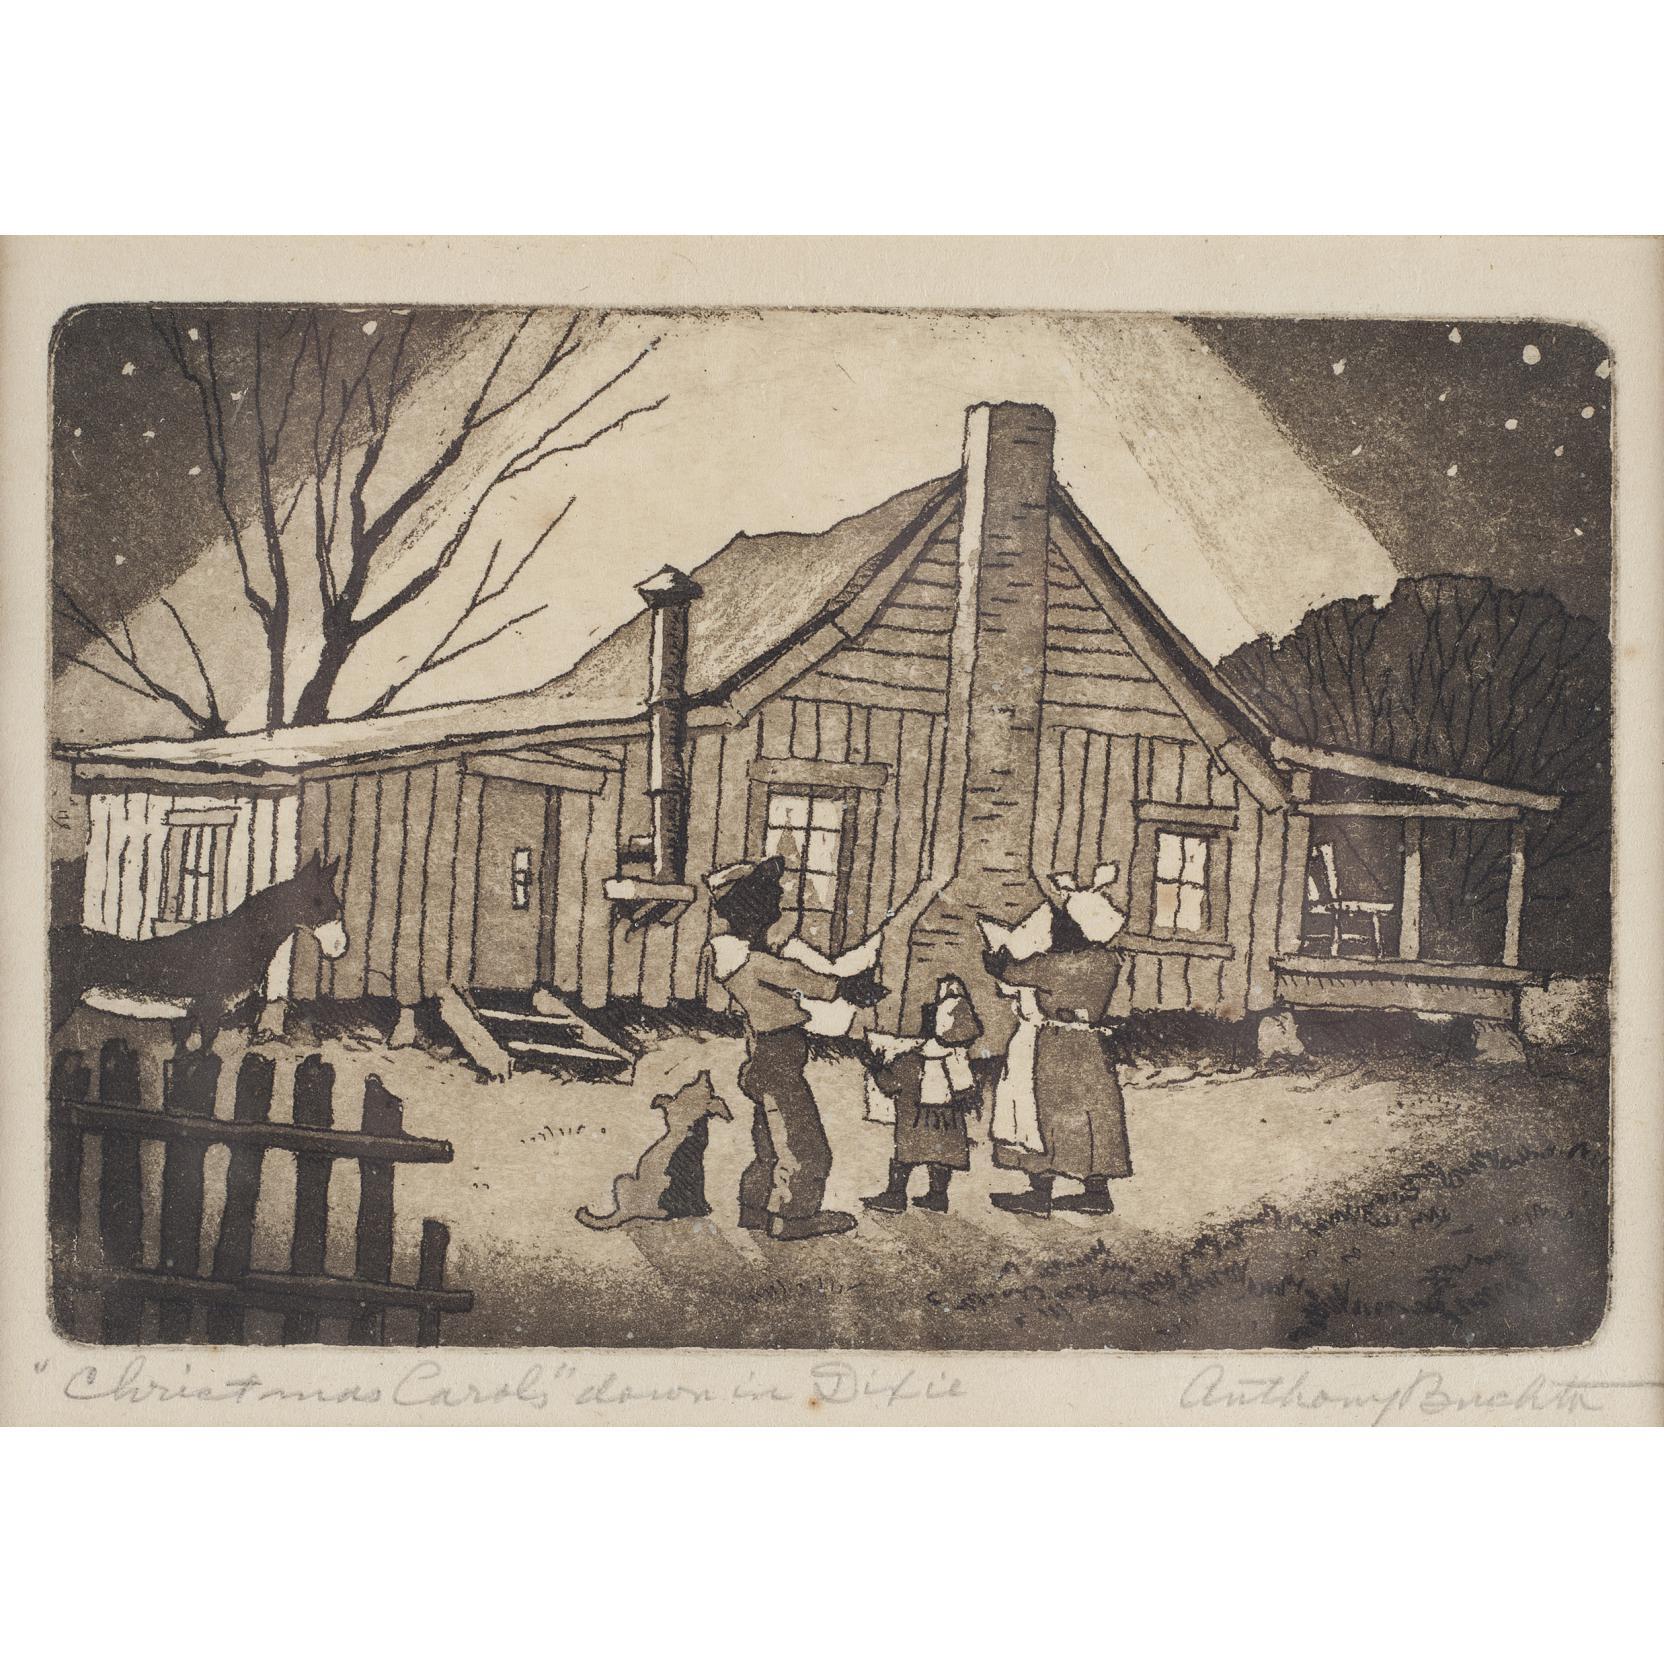 anthony-buchta-ia-1894-1967-southern-etching